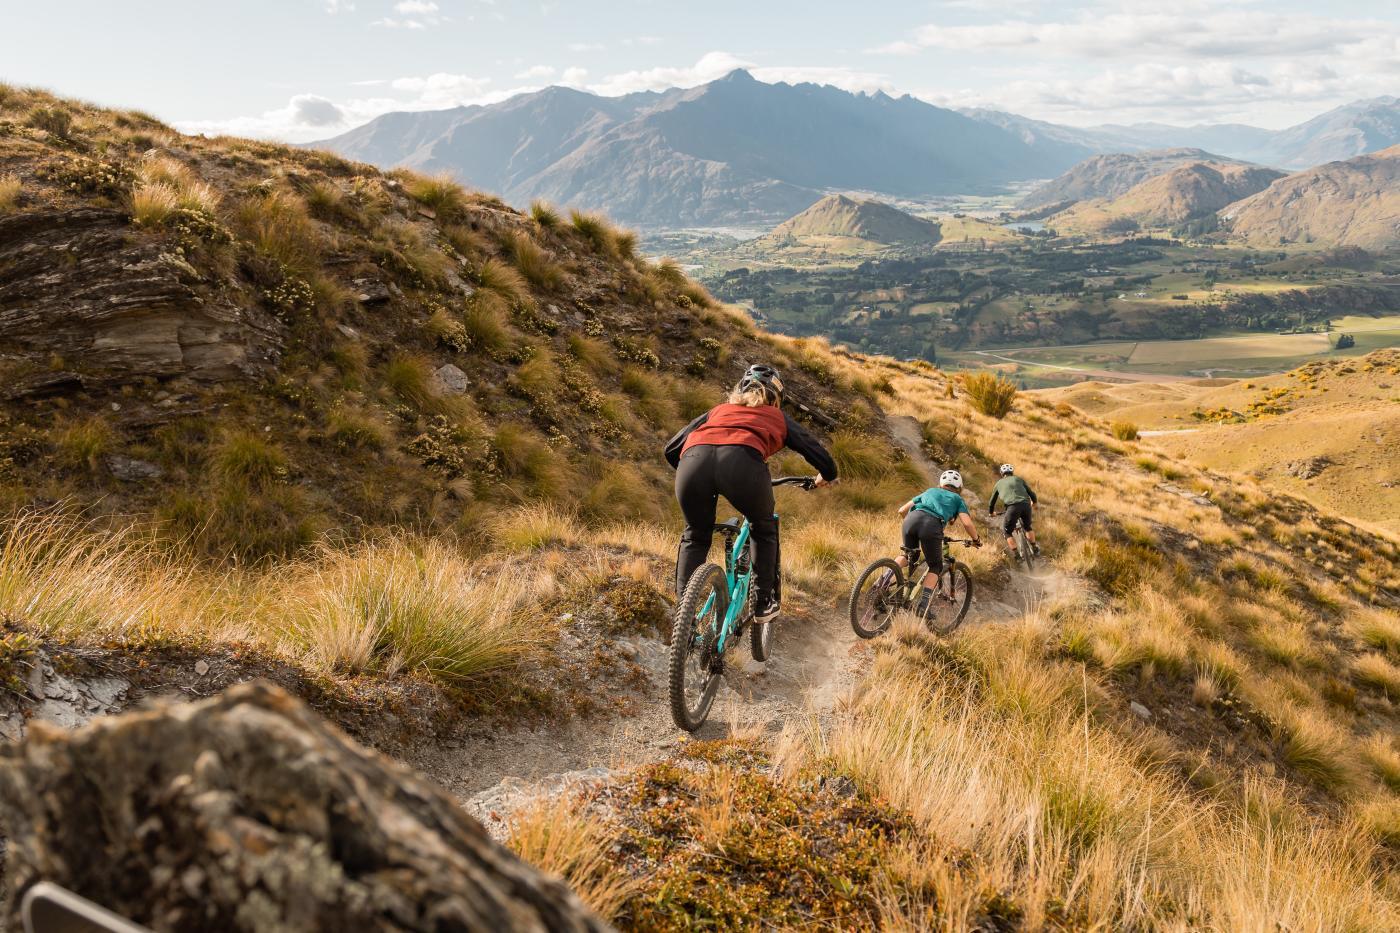 Mountain bikers downhill on Pack Sack & Track, Mountain Bike Trail, Coronet Peak